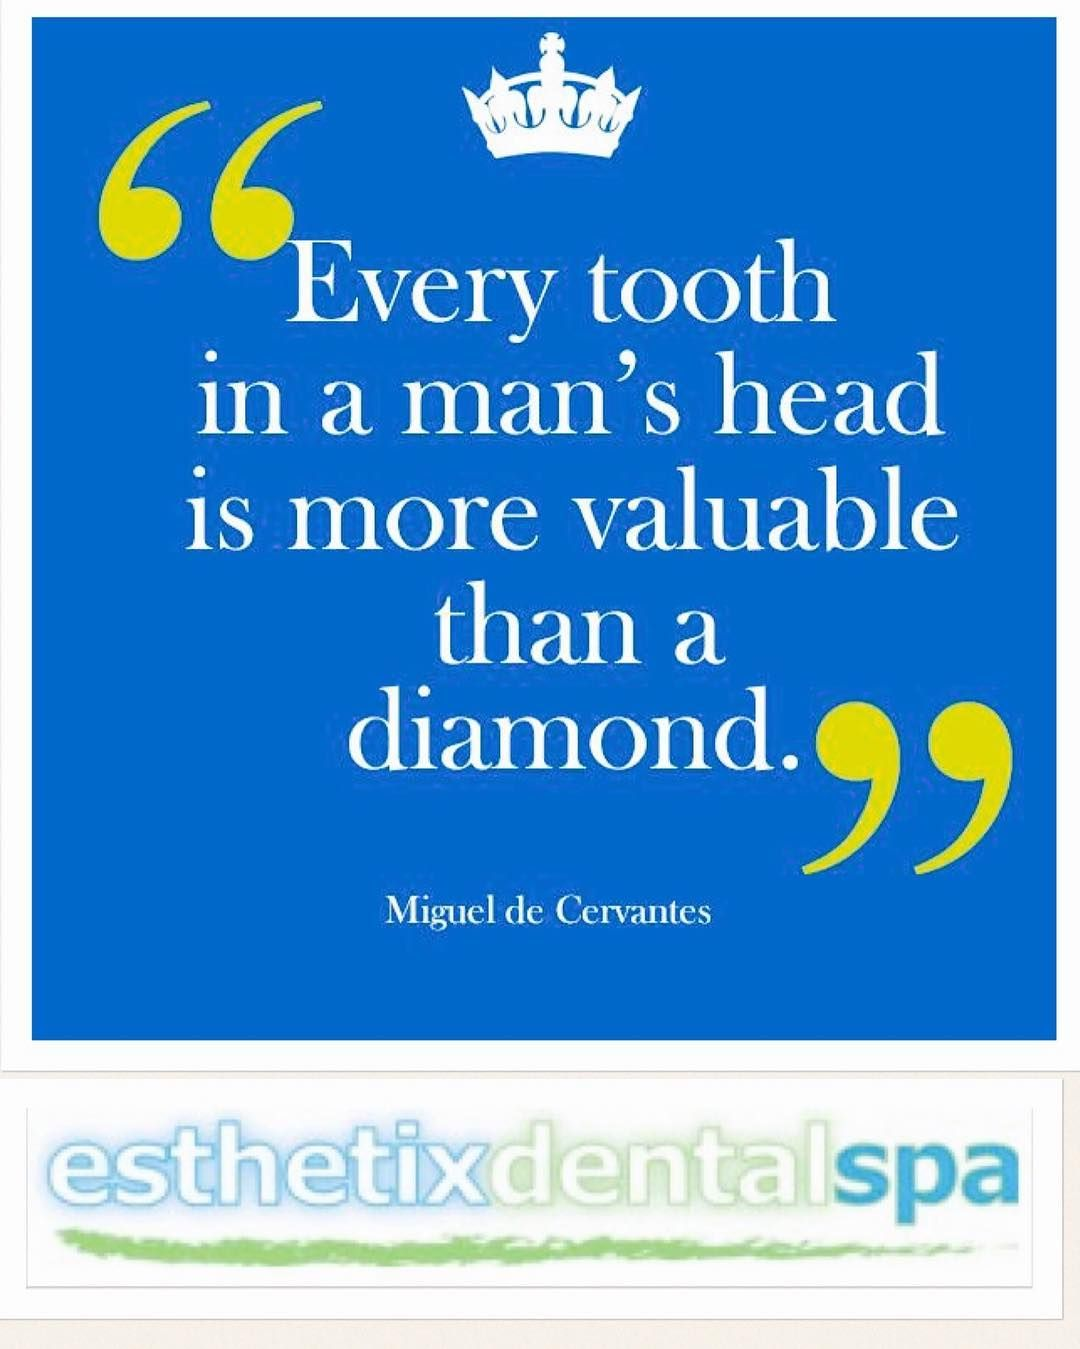 Dental Implant Quotes Dentist Invisalign Dentalimplant Veneers Braces Nyc